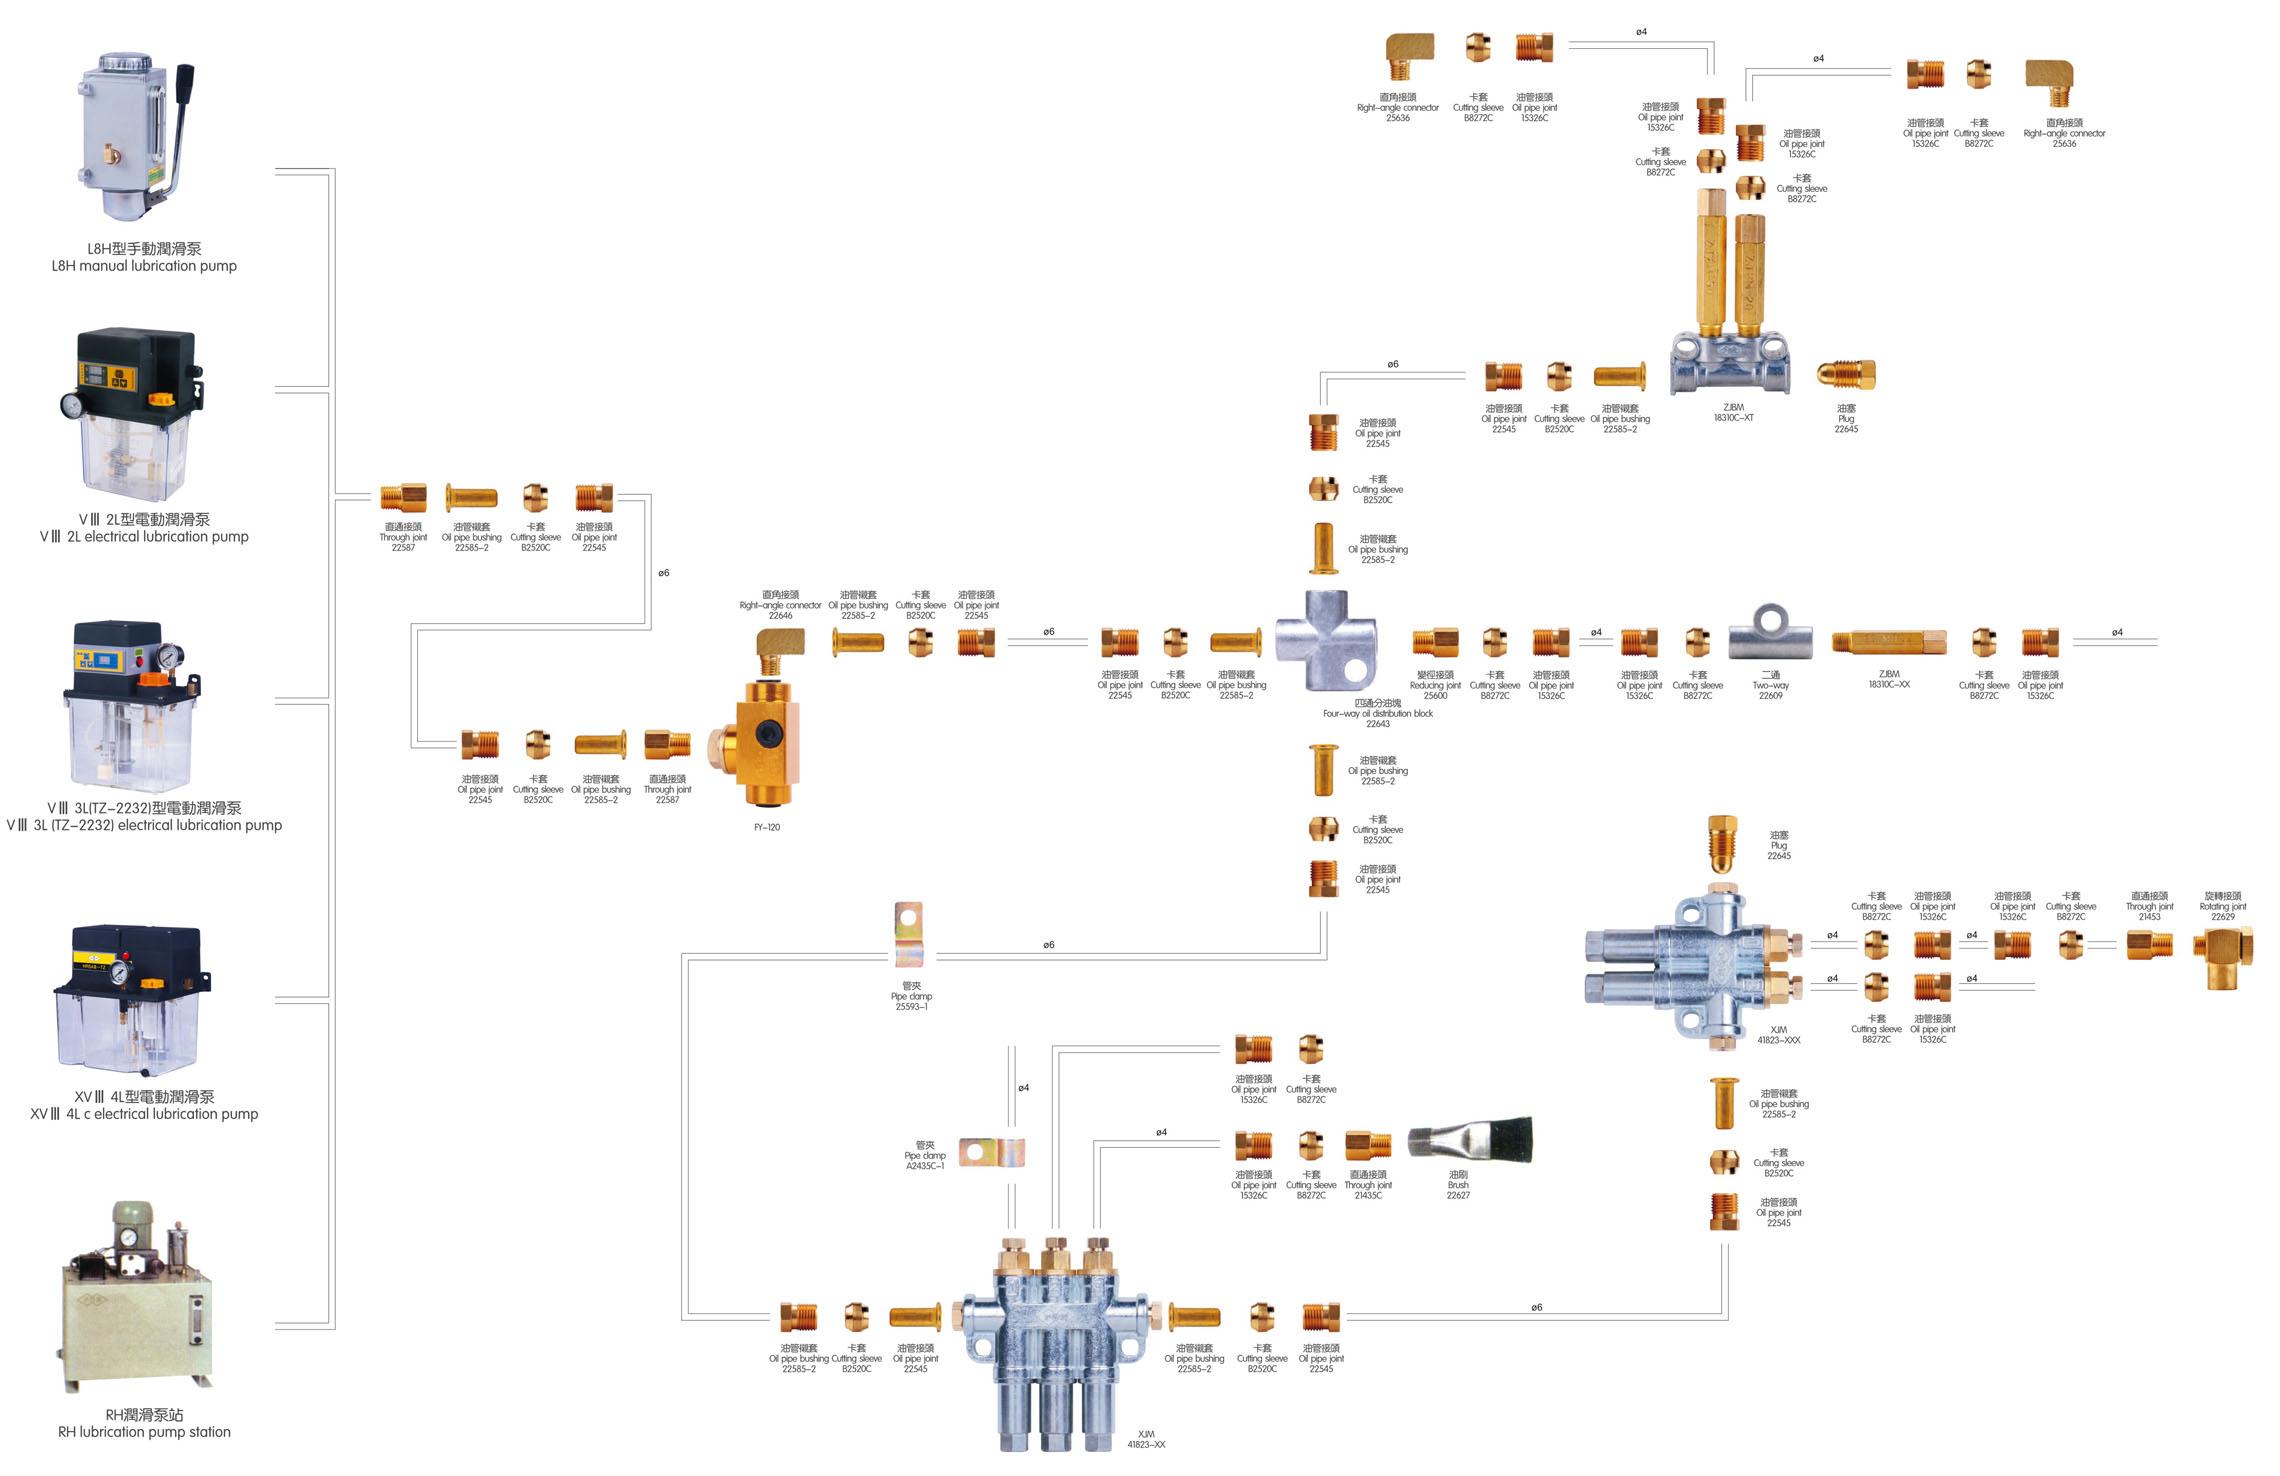 hurun lubricating oil pump rh cnhurun cn Water Pump Lubricant Lubrication System Fittings